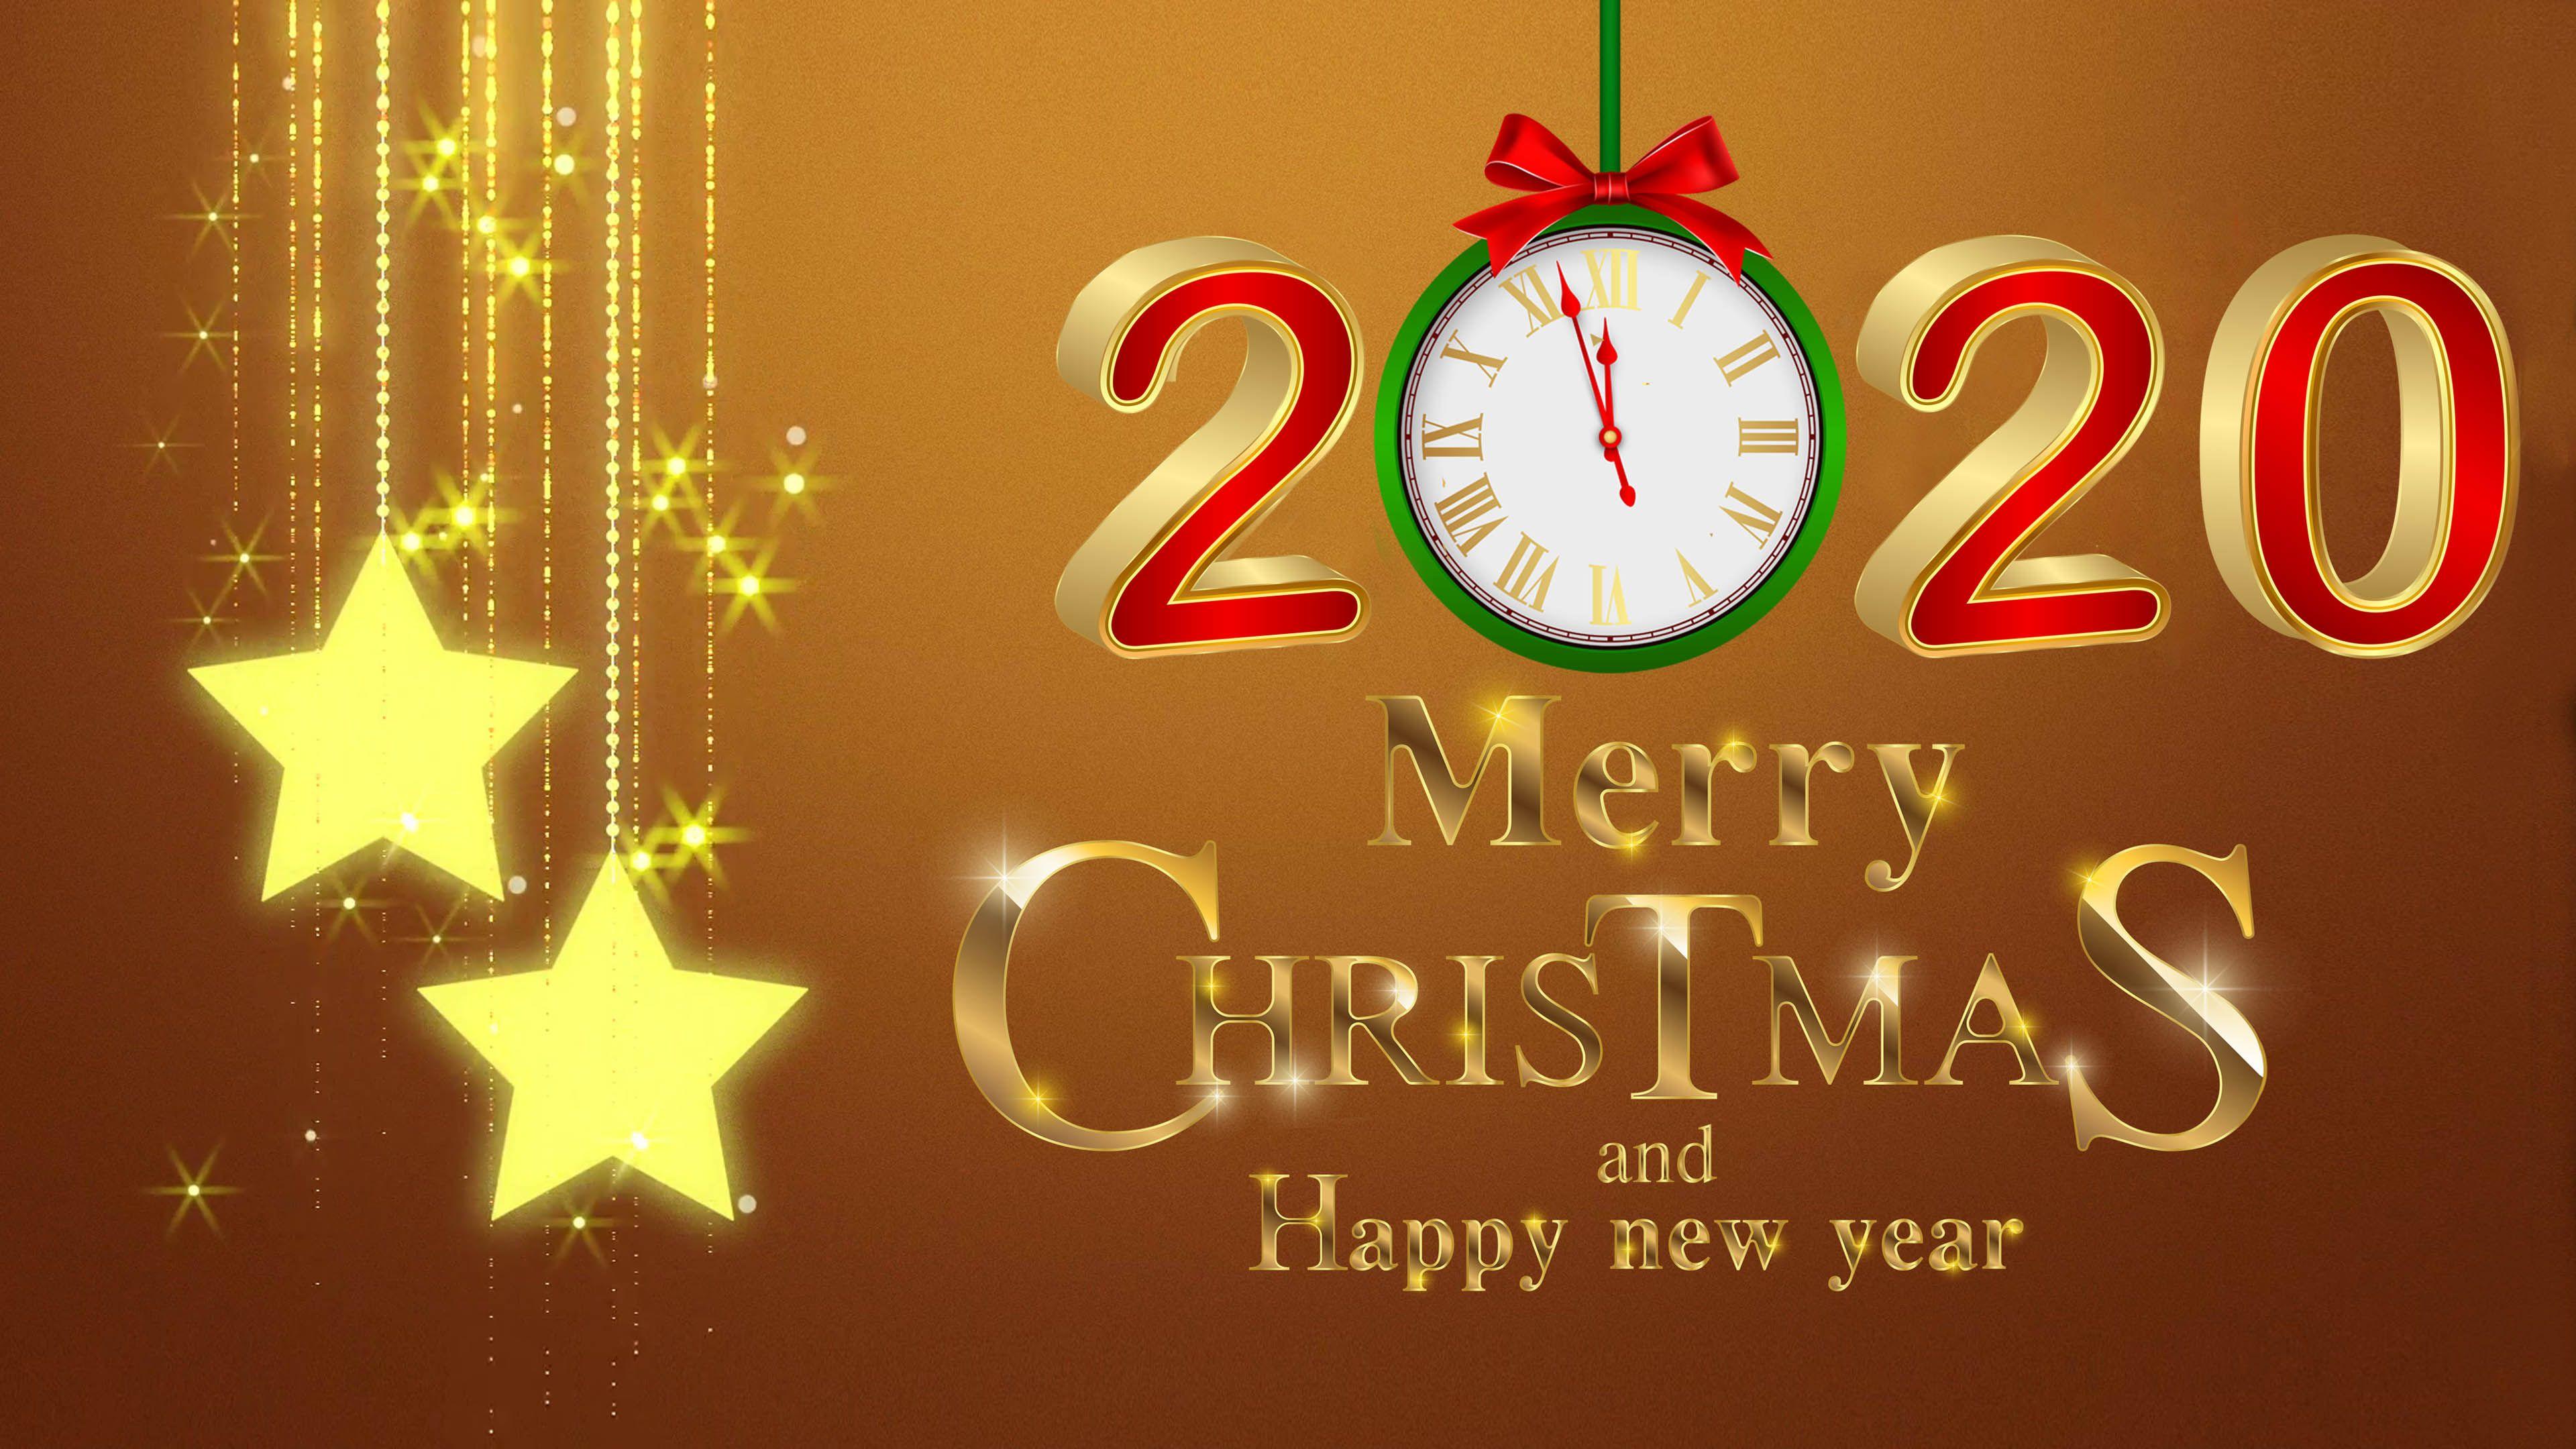 2020 happy new year Google pretraživanje Merry